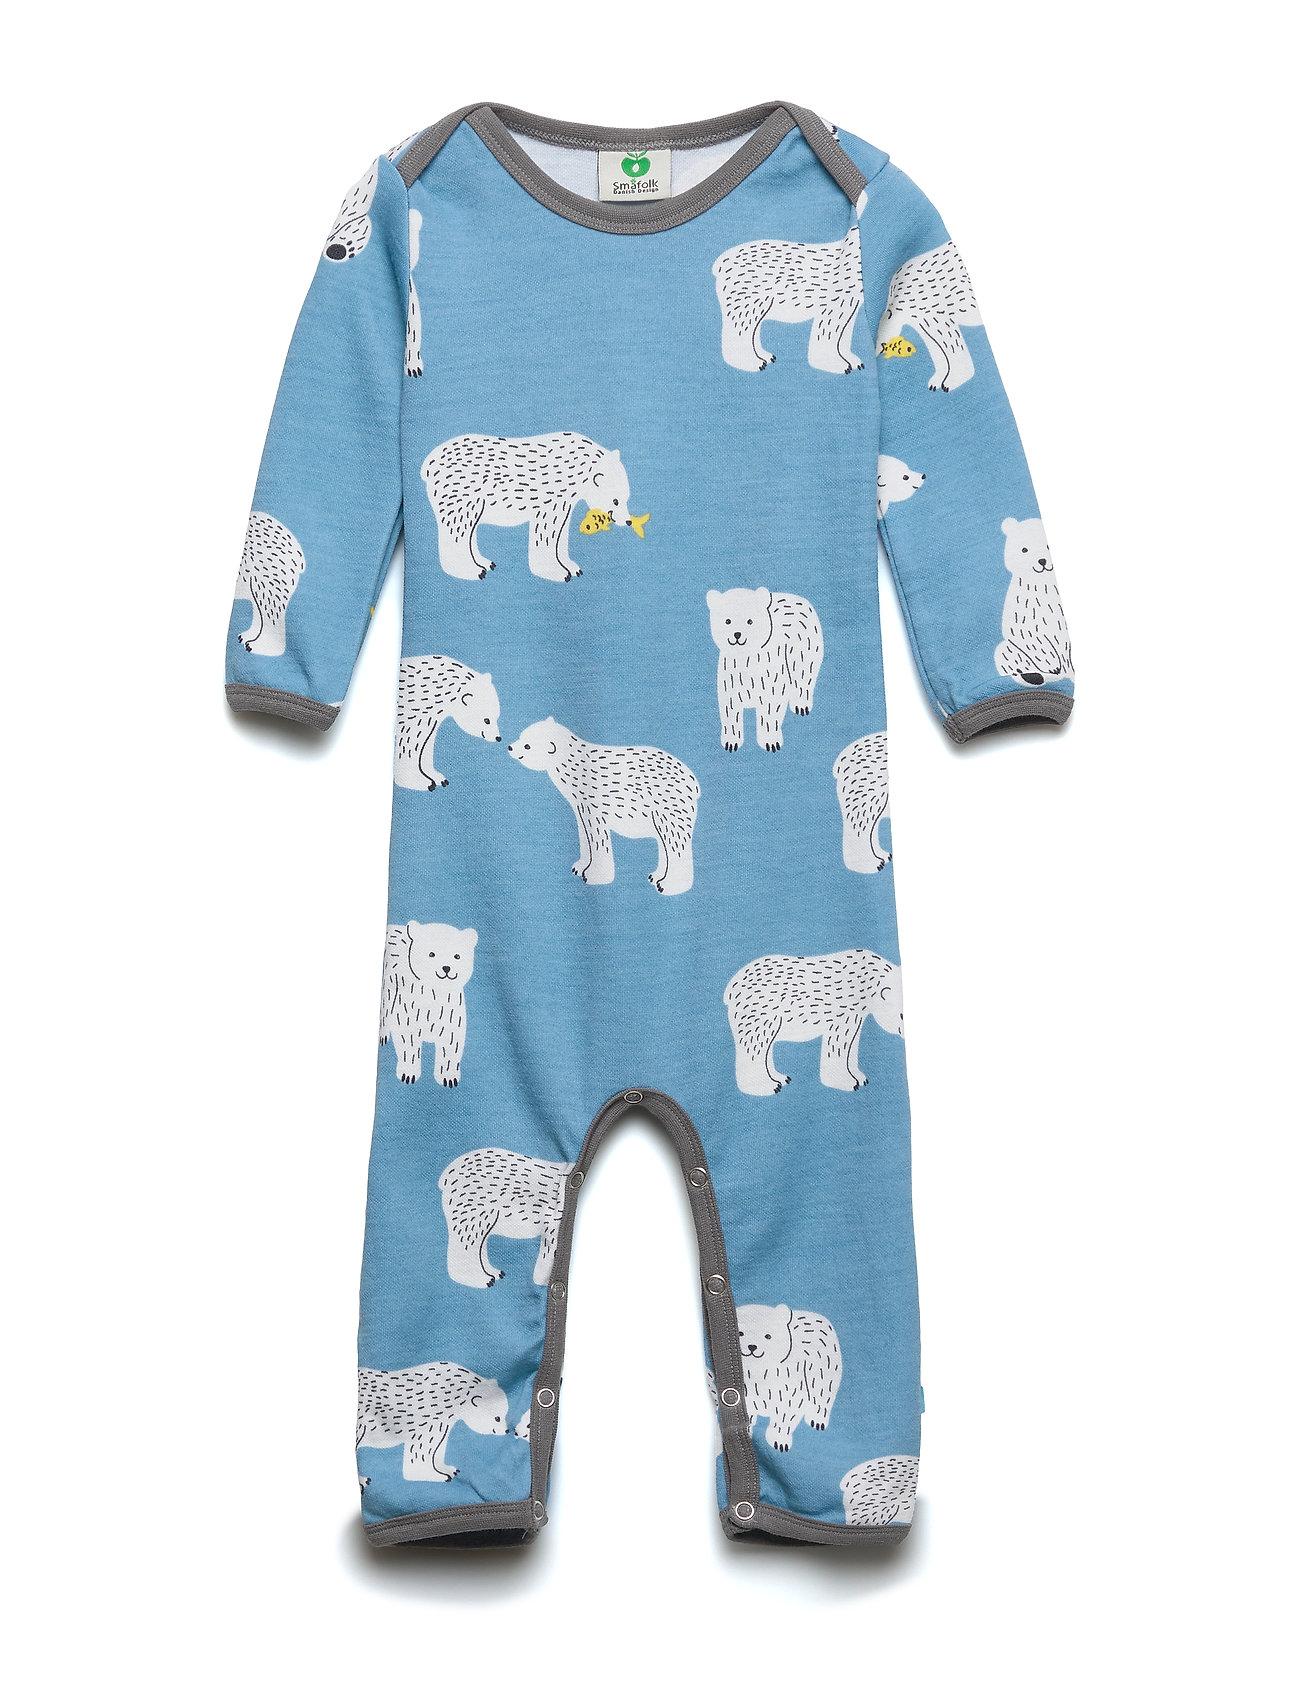 Småfolk Body Suit LS WoolMix. Bear - WINTER BLUE